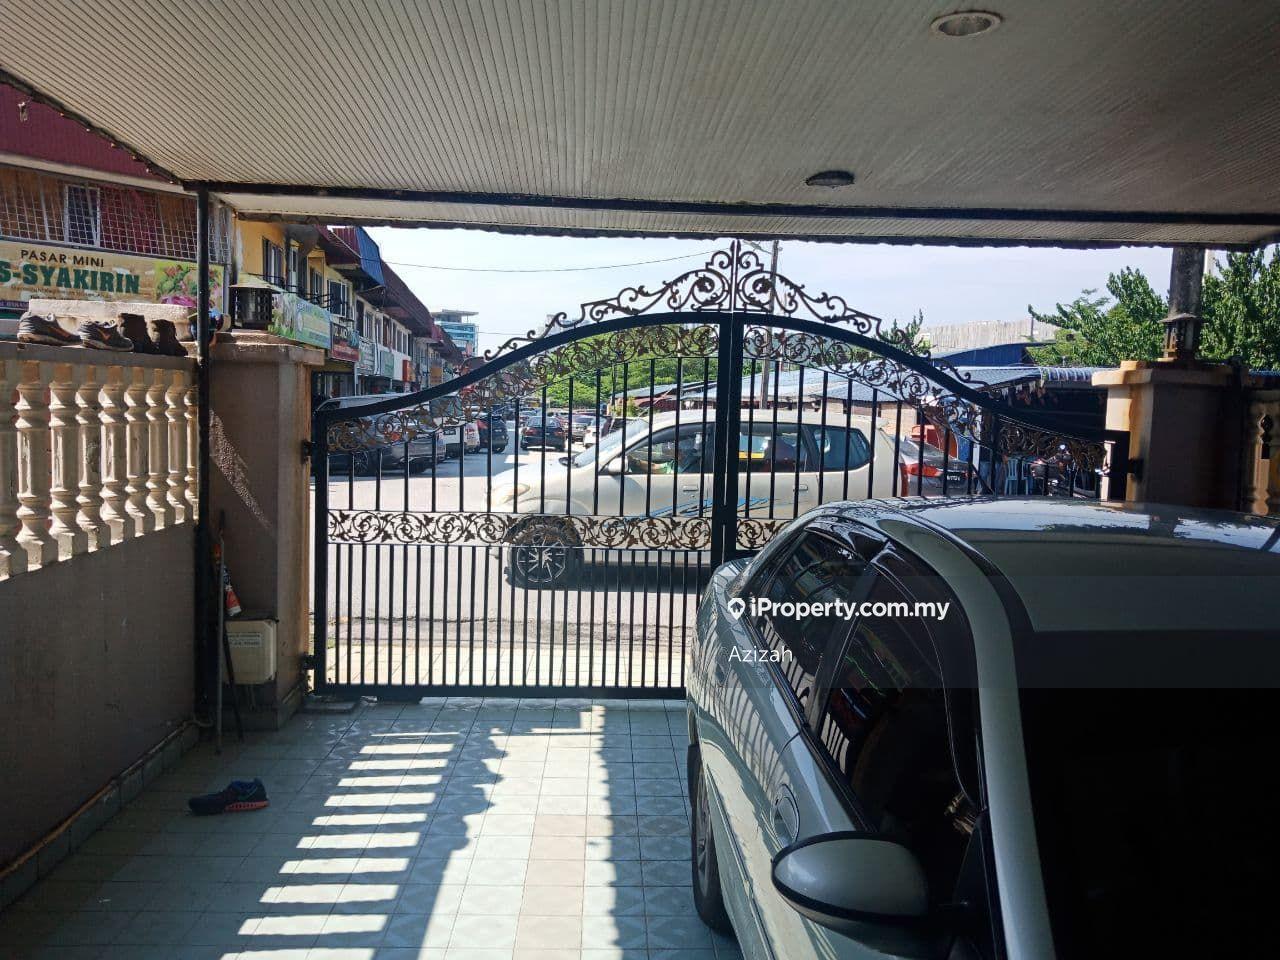 Double Storey Intermediate Jalan J Taman Melawati, Ulu Klang